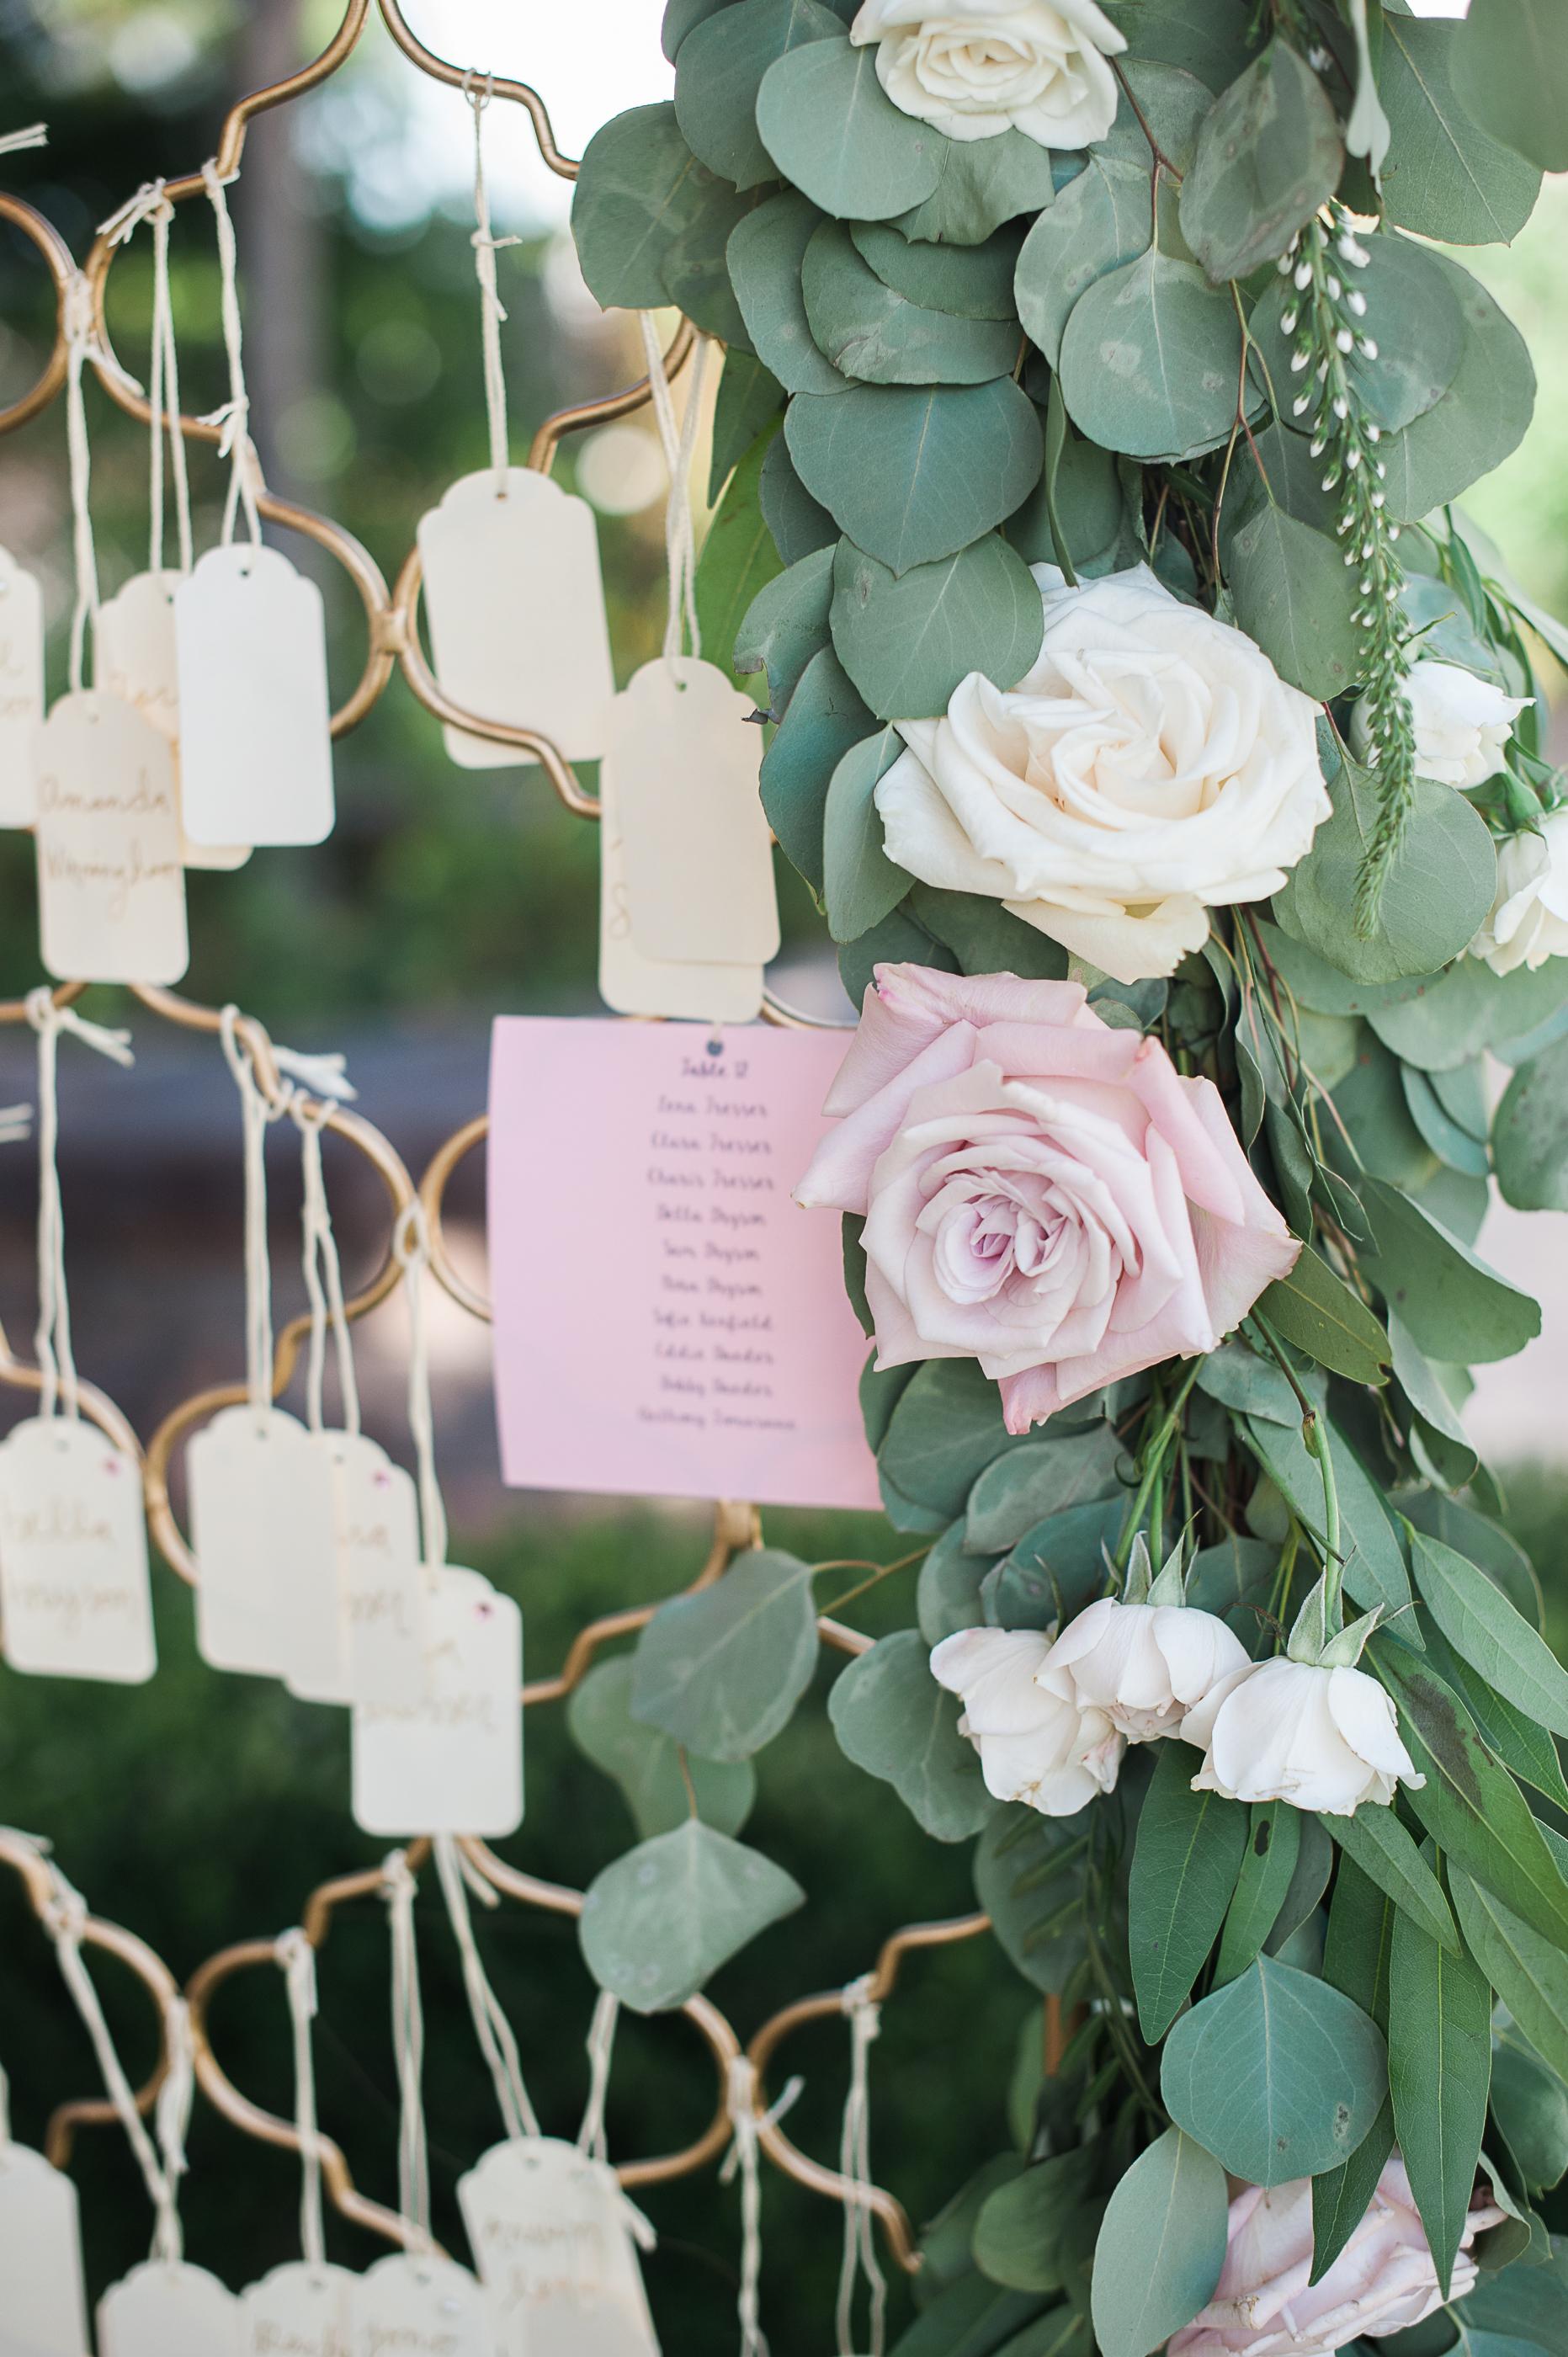 Eucalyptus & rose escort card garland by San Diego Florist, Compass Floral.  Brandi Welles Photography.